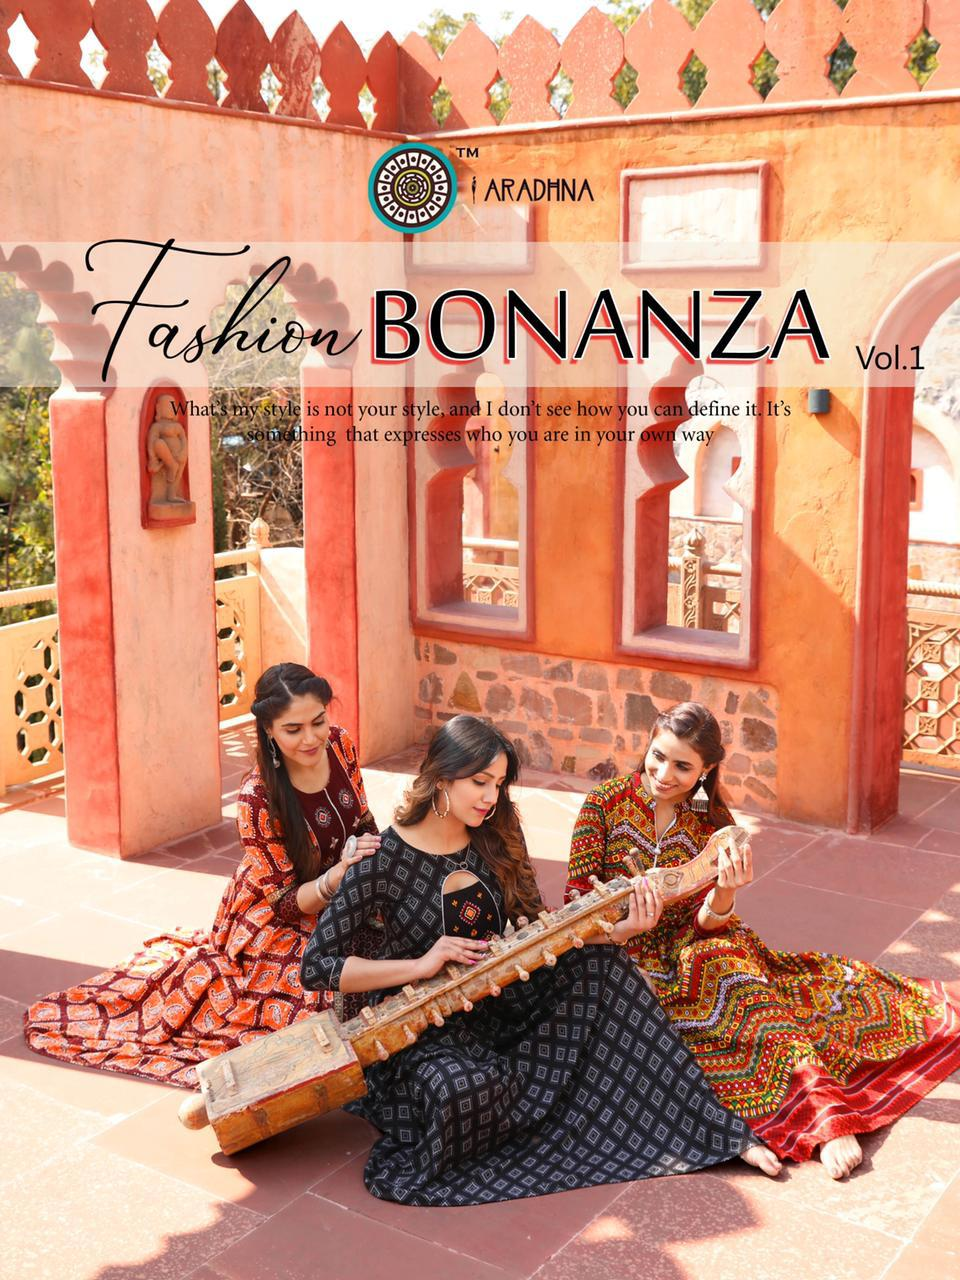 Aradhna Fashion Bonanza Vol 1 Kurti Wholesale Catalog 12 Pcs 3 - Aradhna Fashion Bonanza Vol 1 Kurti Wholesale Catalog 12 Pcs